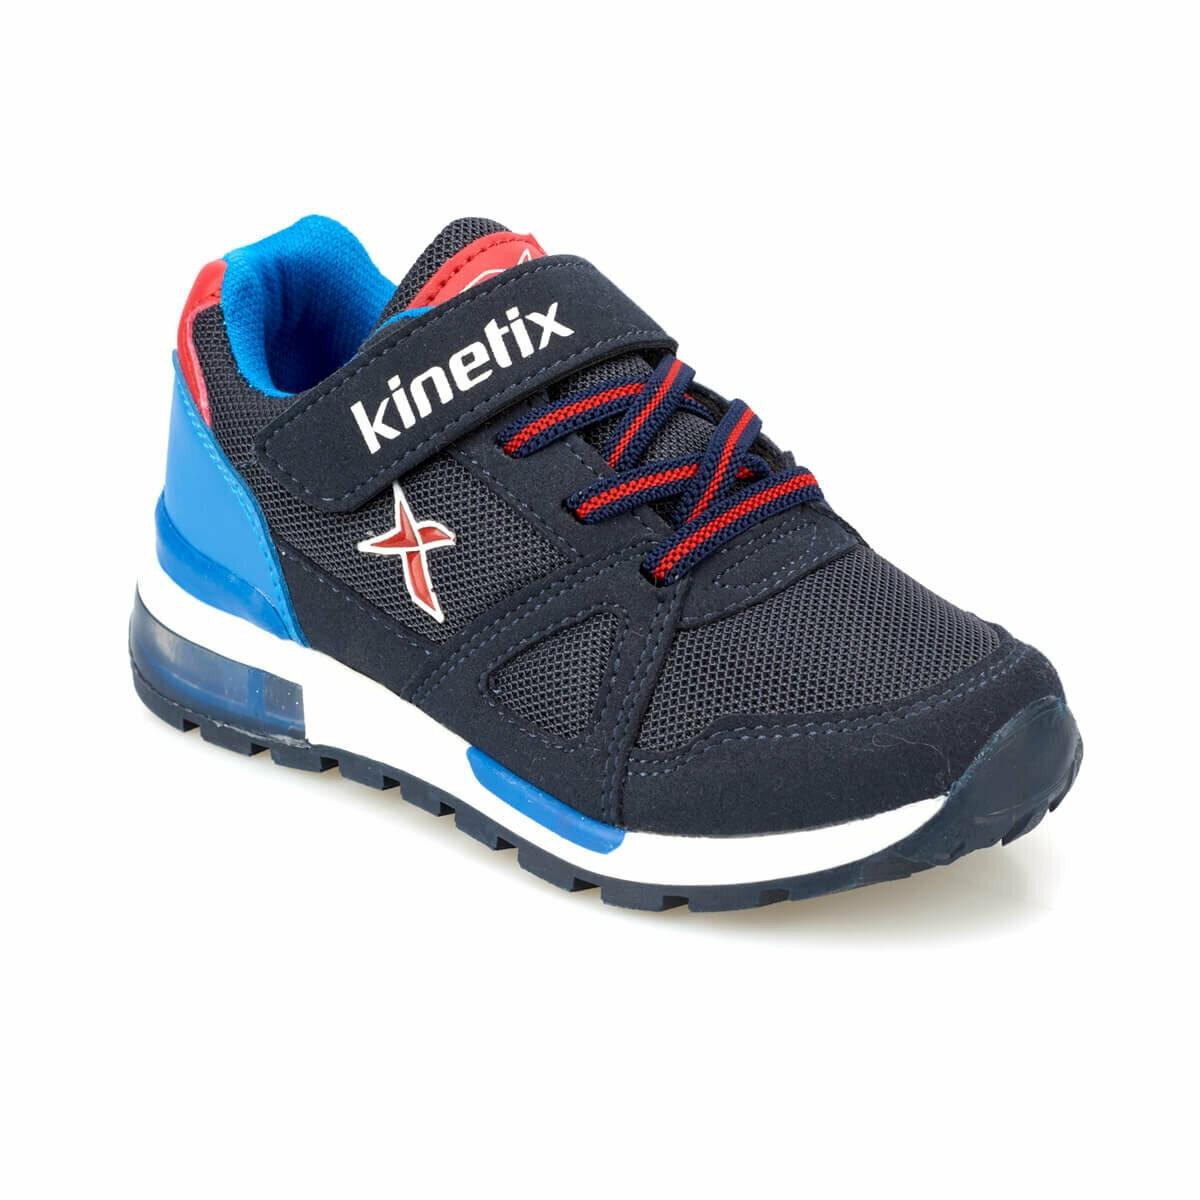 FLO RIVERO Navy Blue Male Child Sneaker Shoes KINETIX